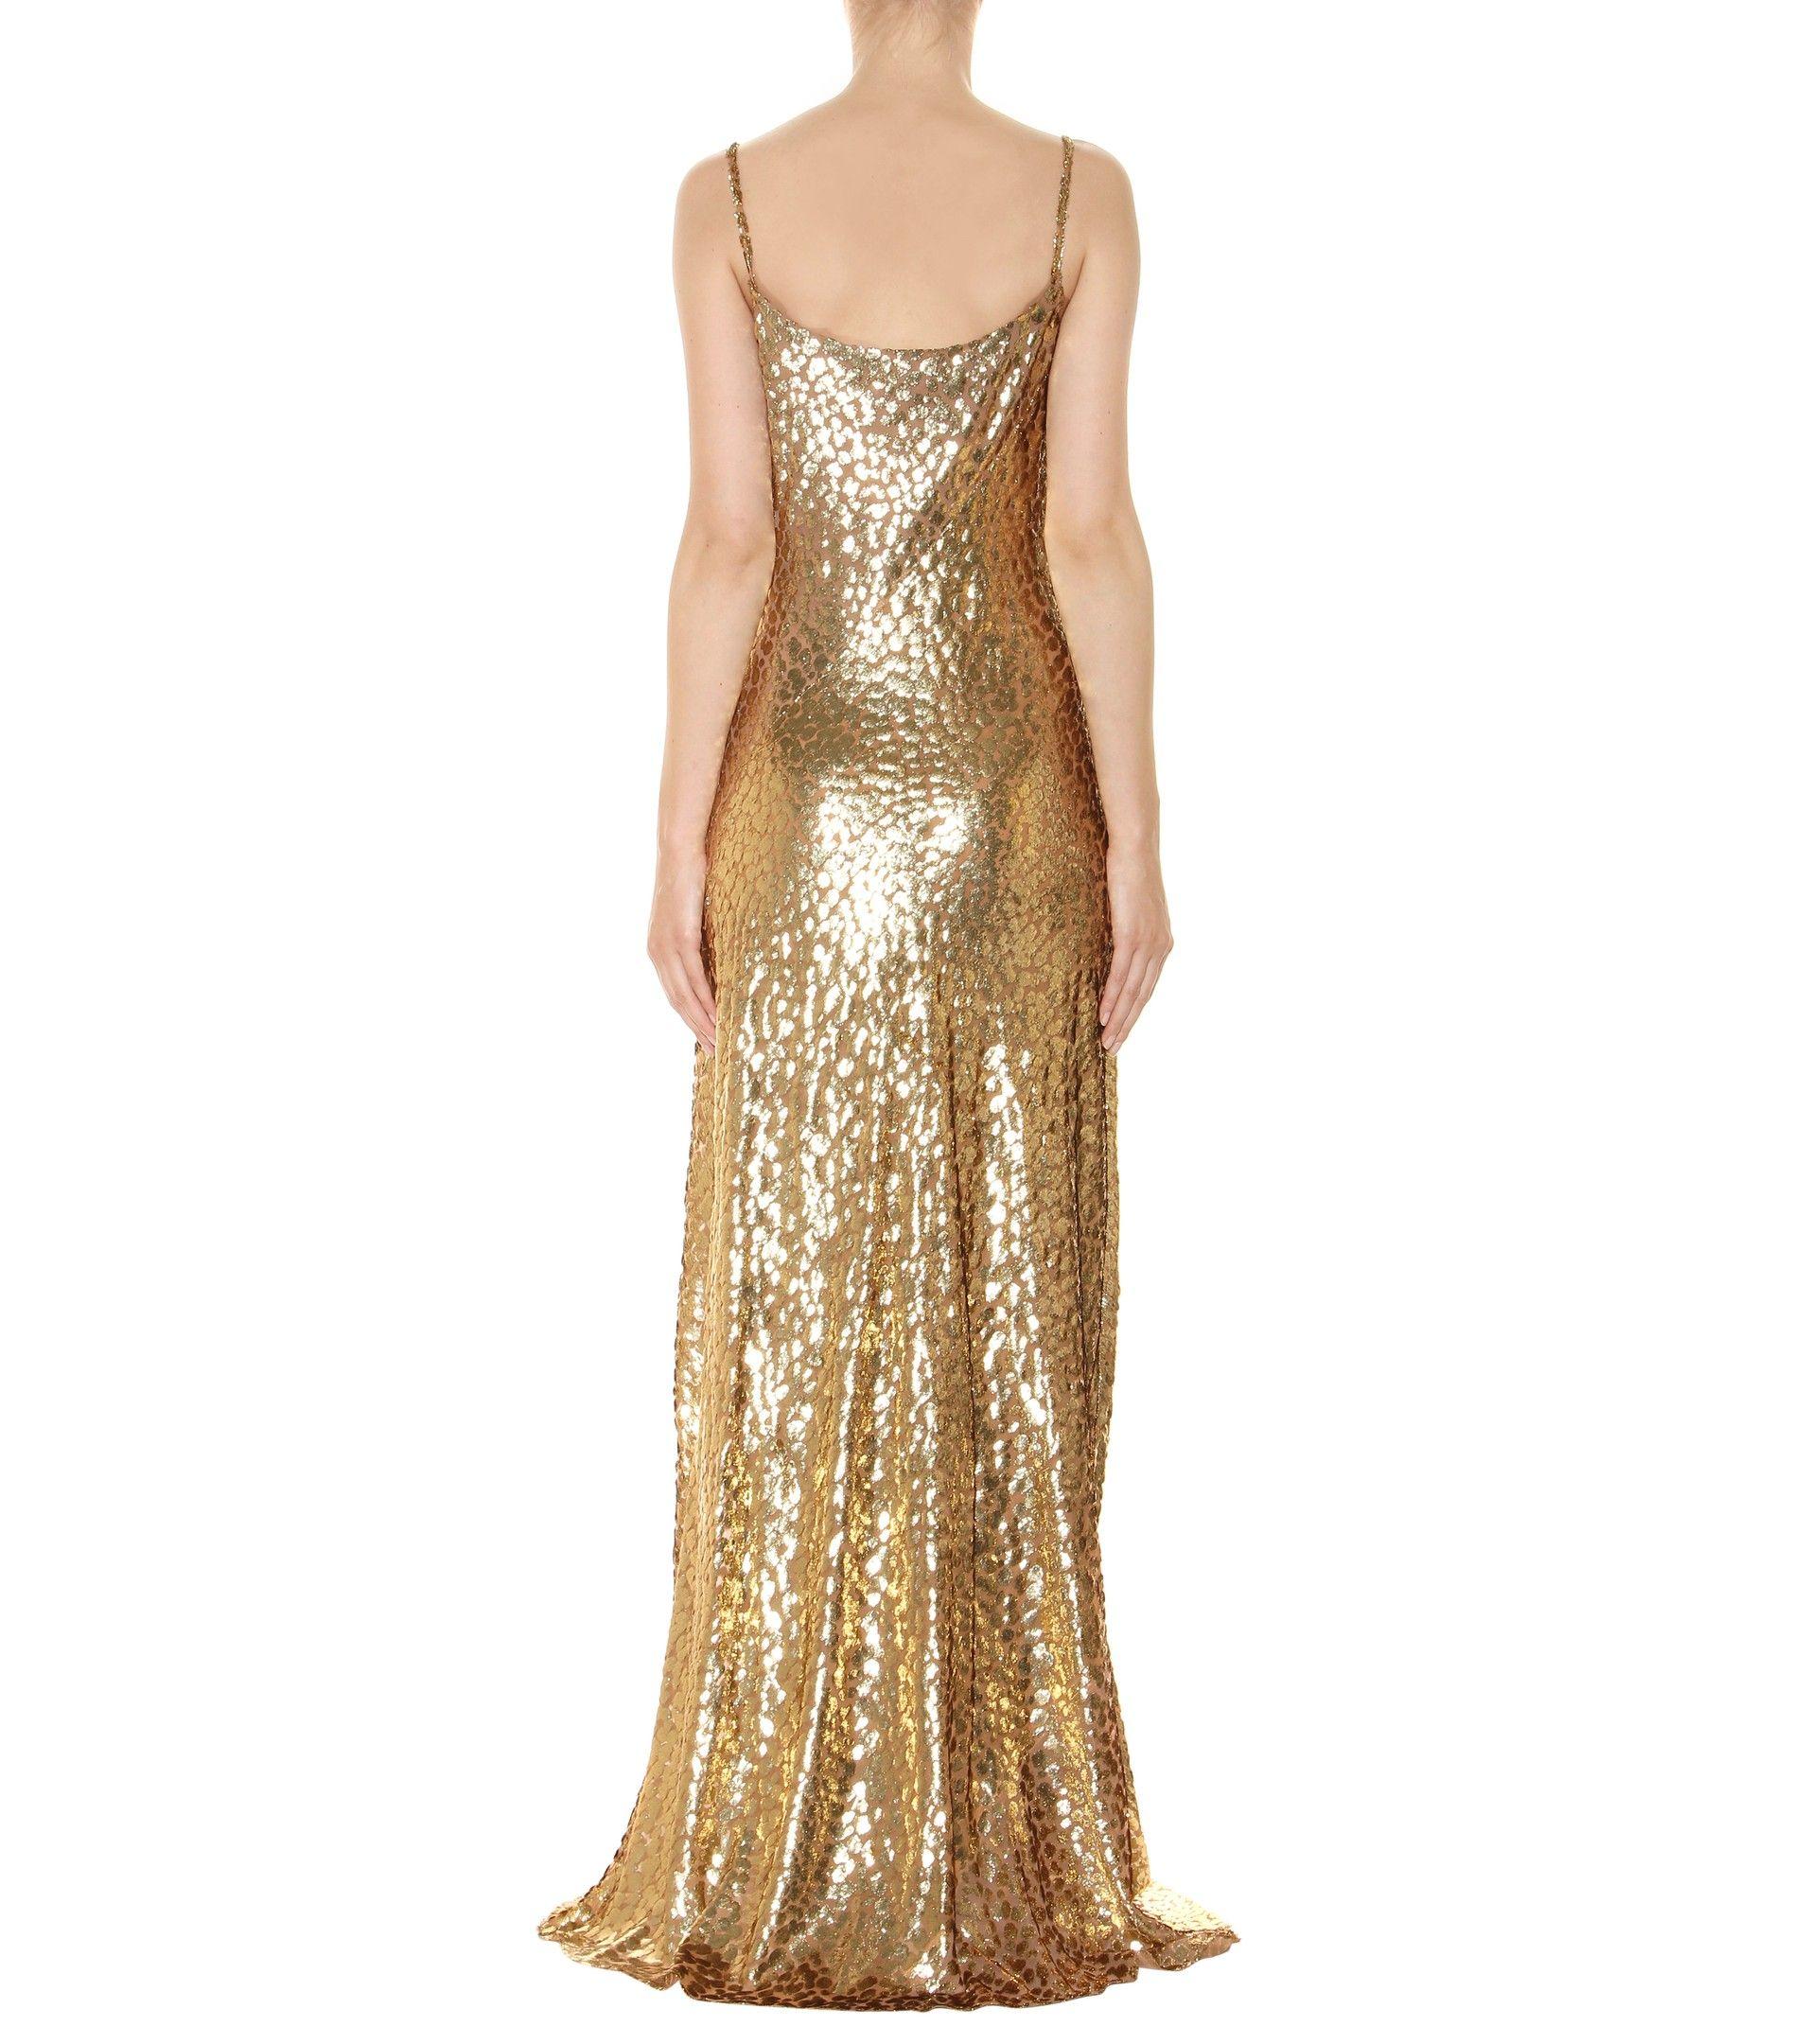 mytheresa.com - Metallic fil coupé dress - Luxury Fashion for Women / Designer clothing, shoes, bags